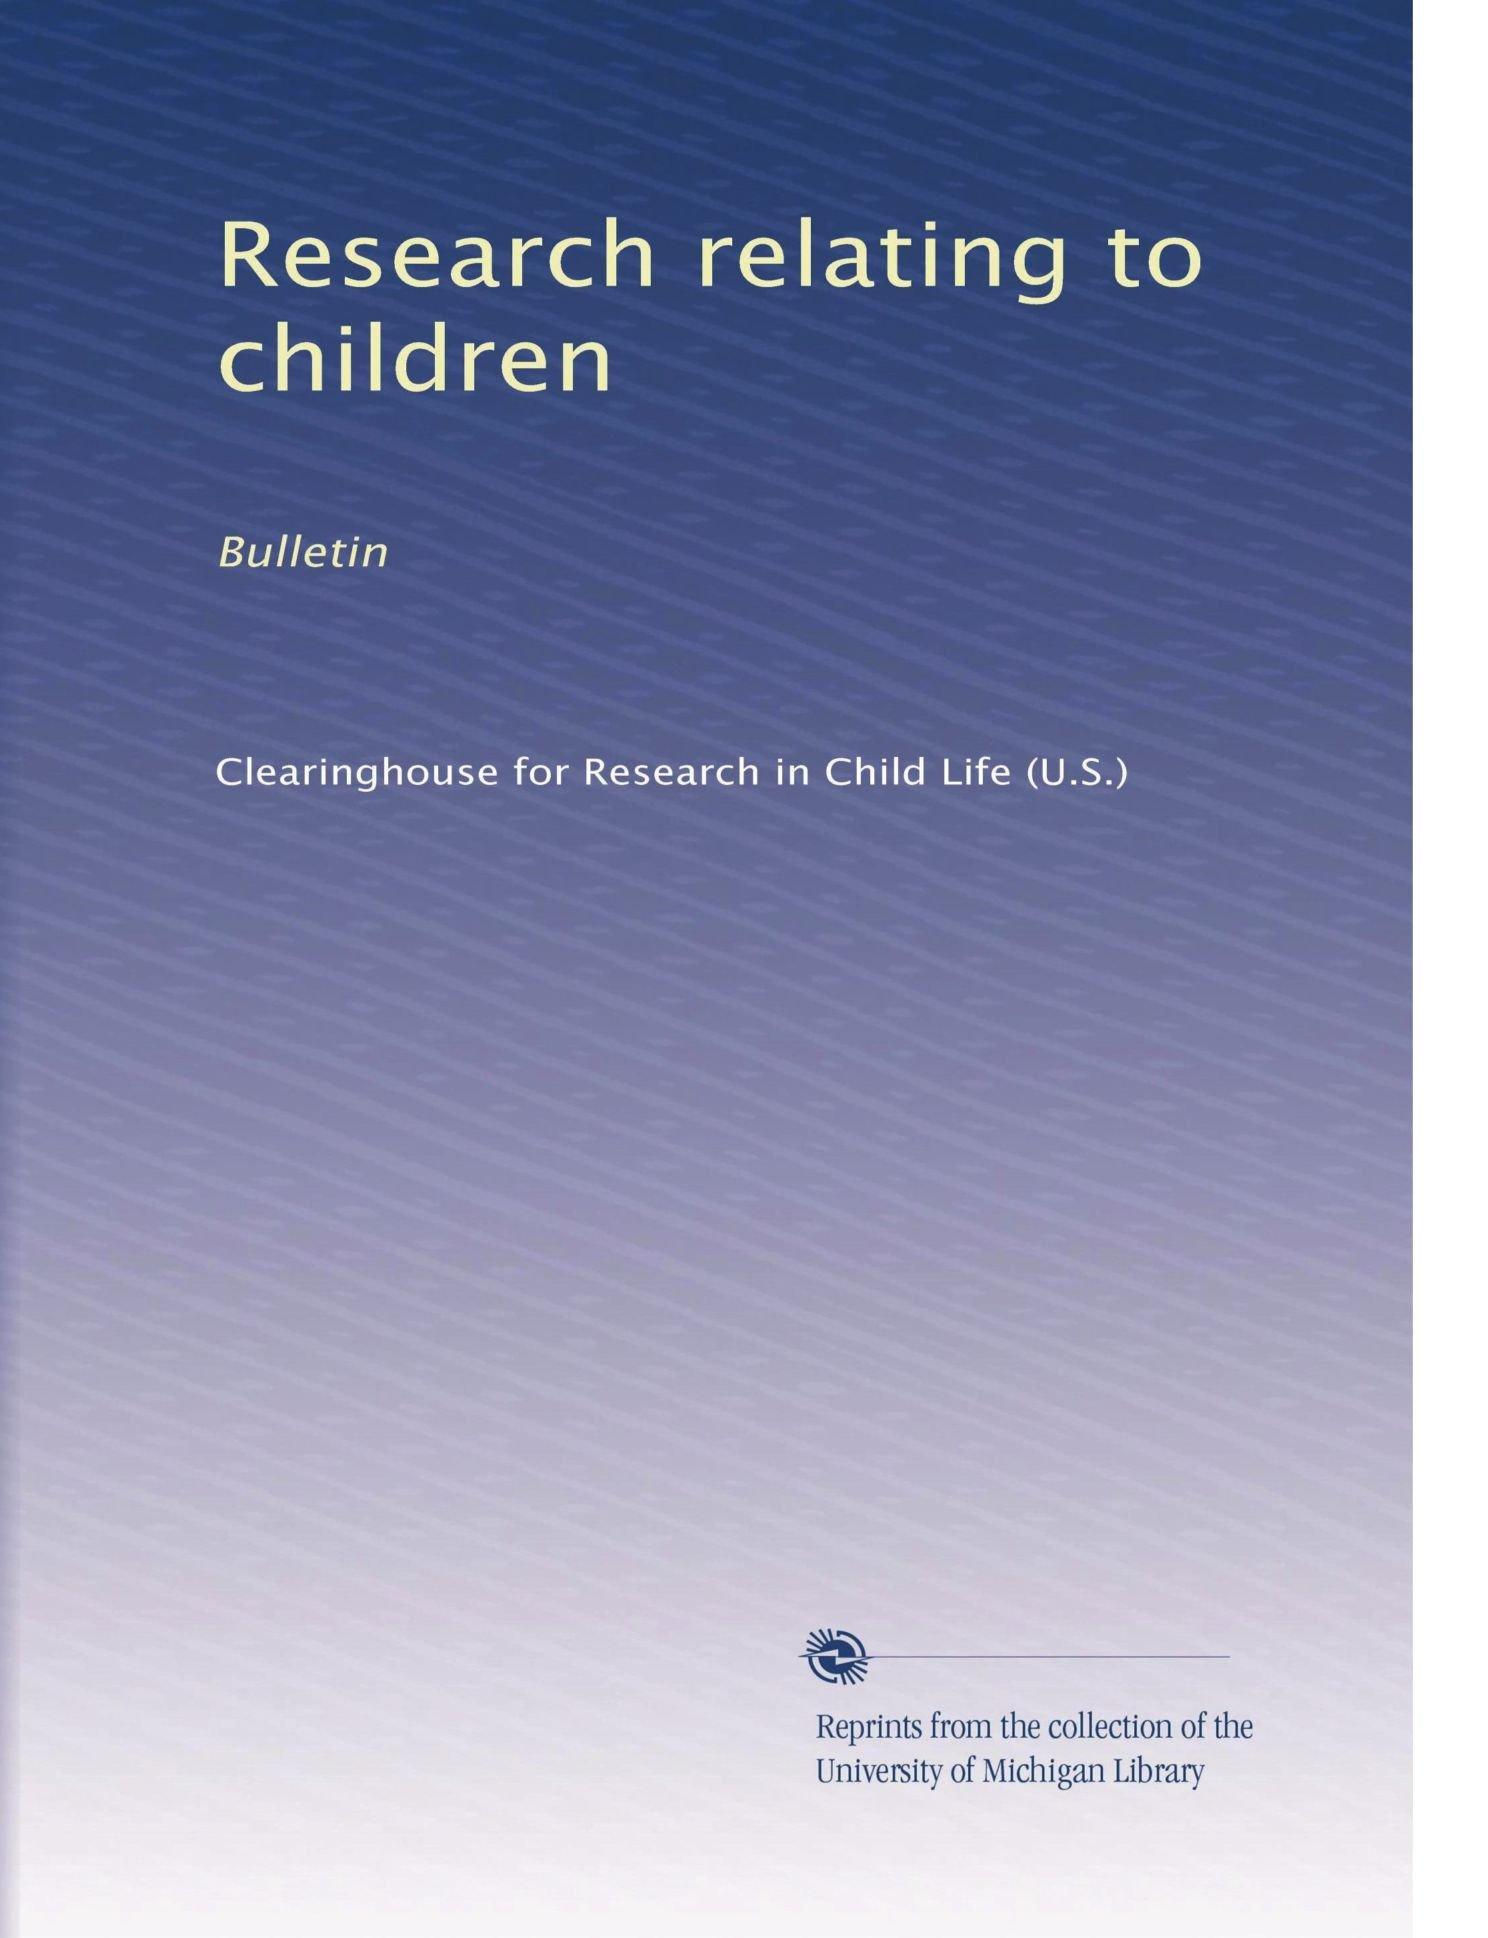 Download Research relating to children: Bulletin (Volume 20) ebook